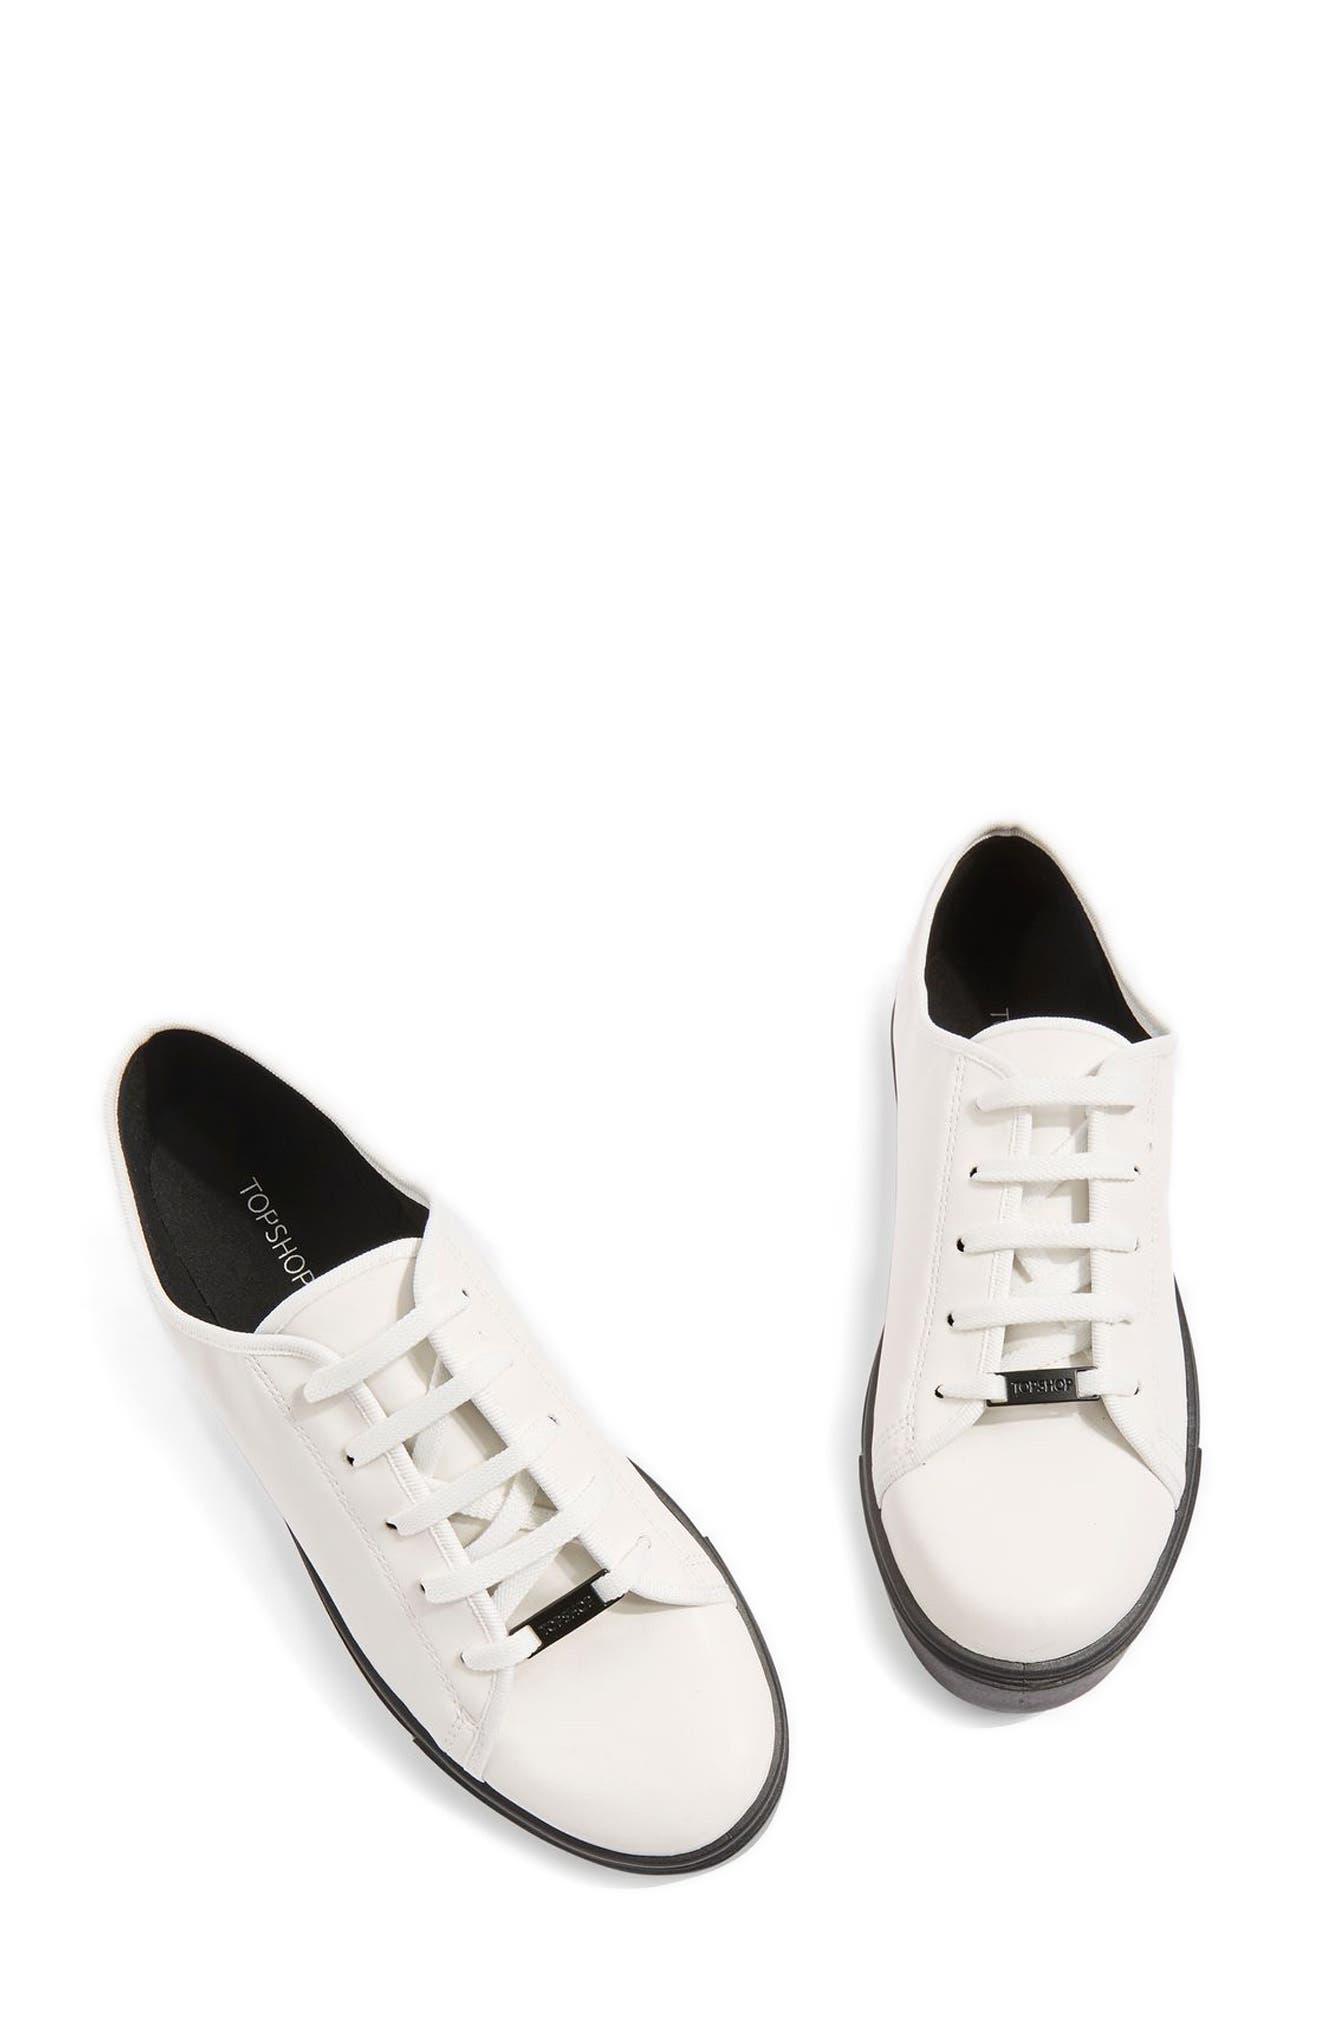 Crush Waterproof Contrast Sole Sneaker,                             Main thumbnail 1, color,                             001